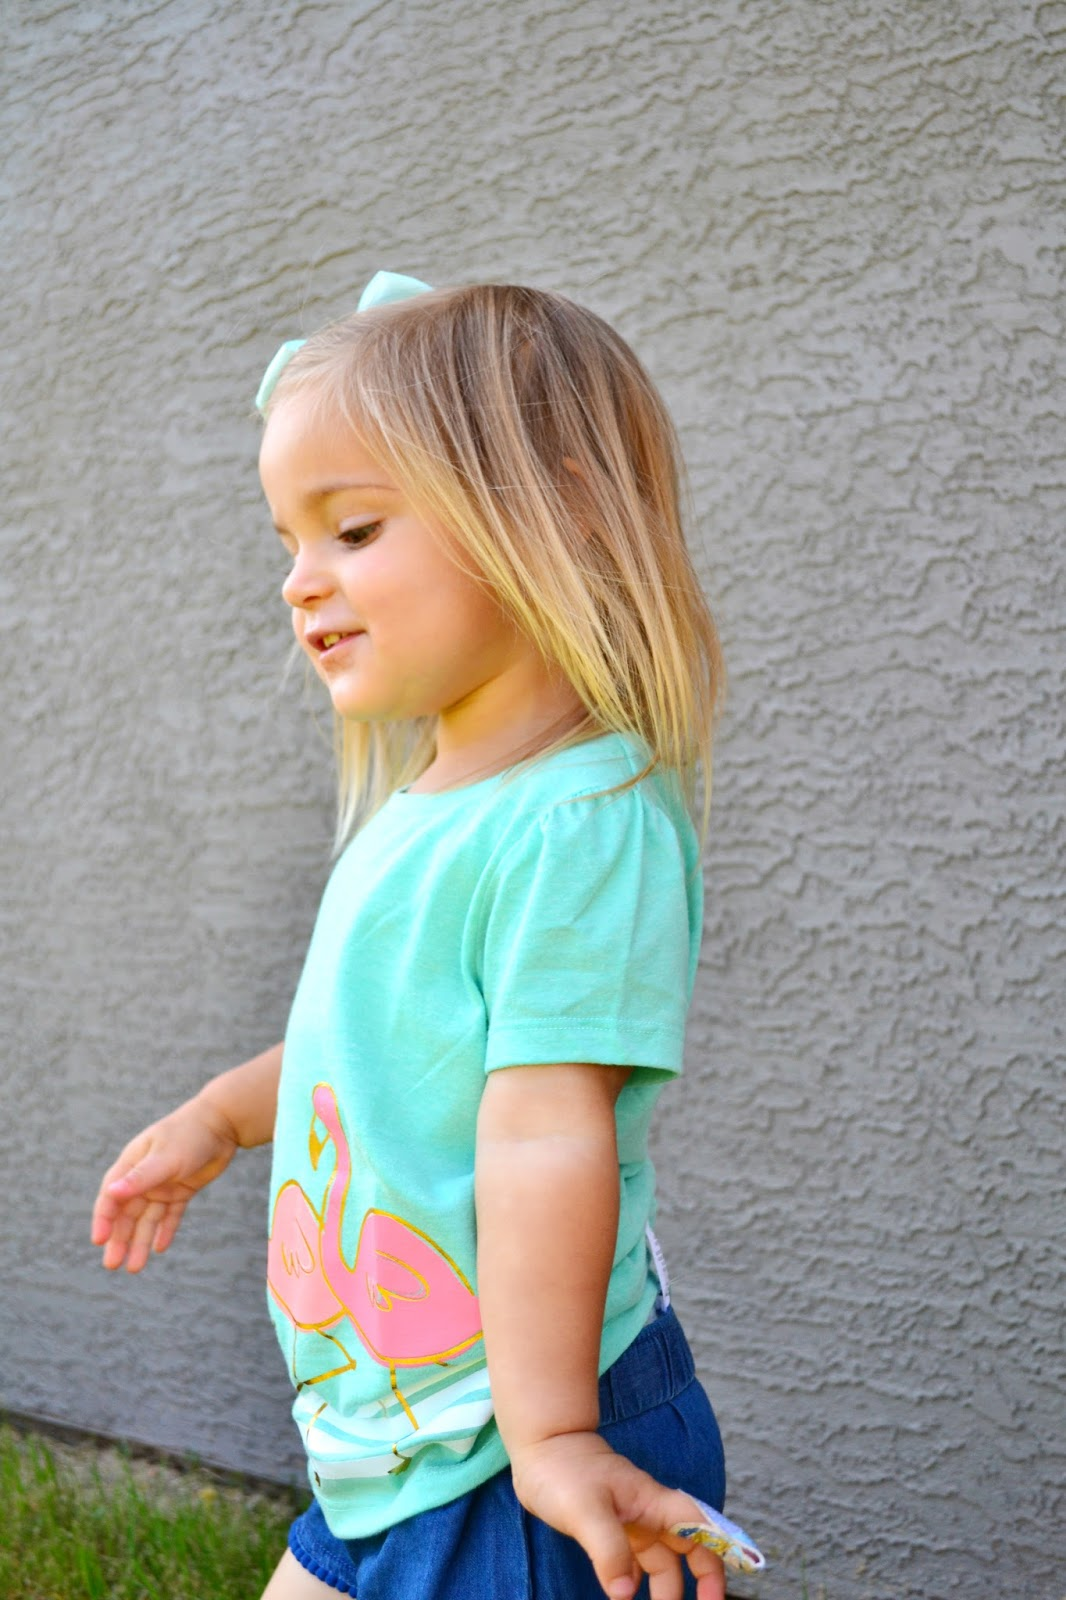 http://www.target.com/p/toddler-girls-flamingo-short-sleeve-graphic-tee-green-circo/-/A-50196949#prodSlot=medium_1_2&term=flamingo+tee